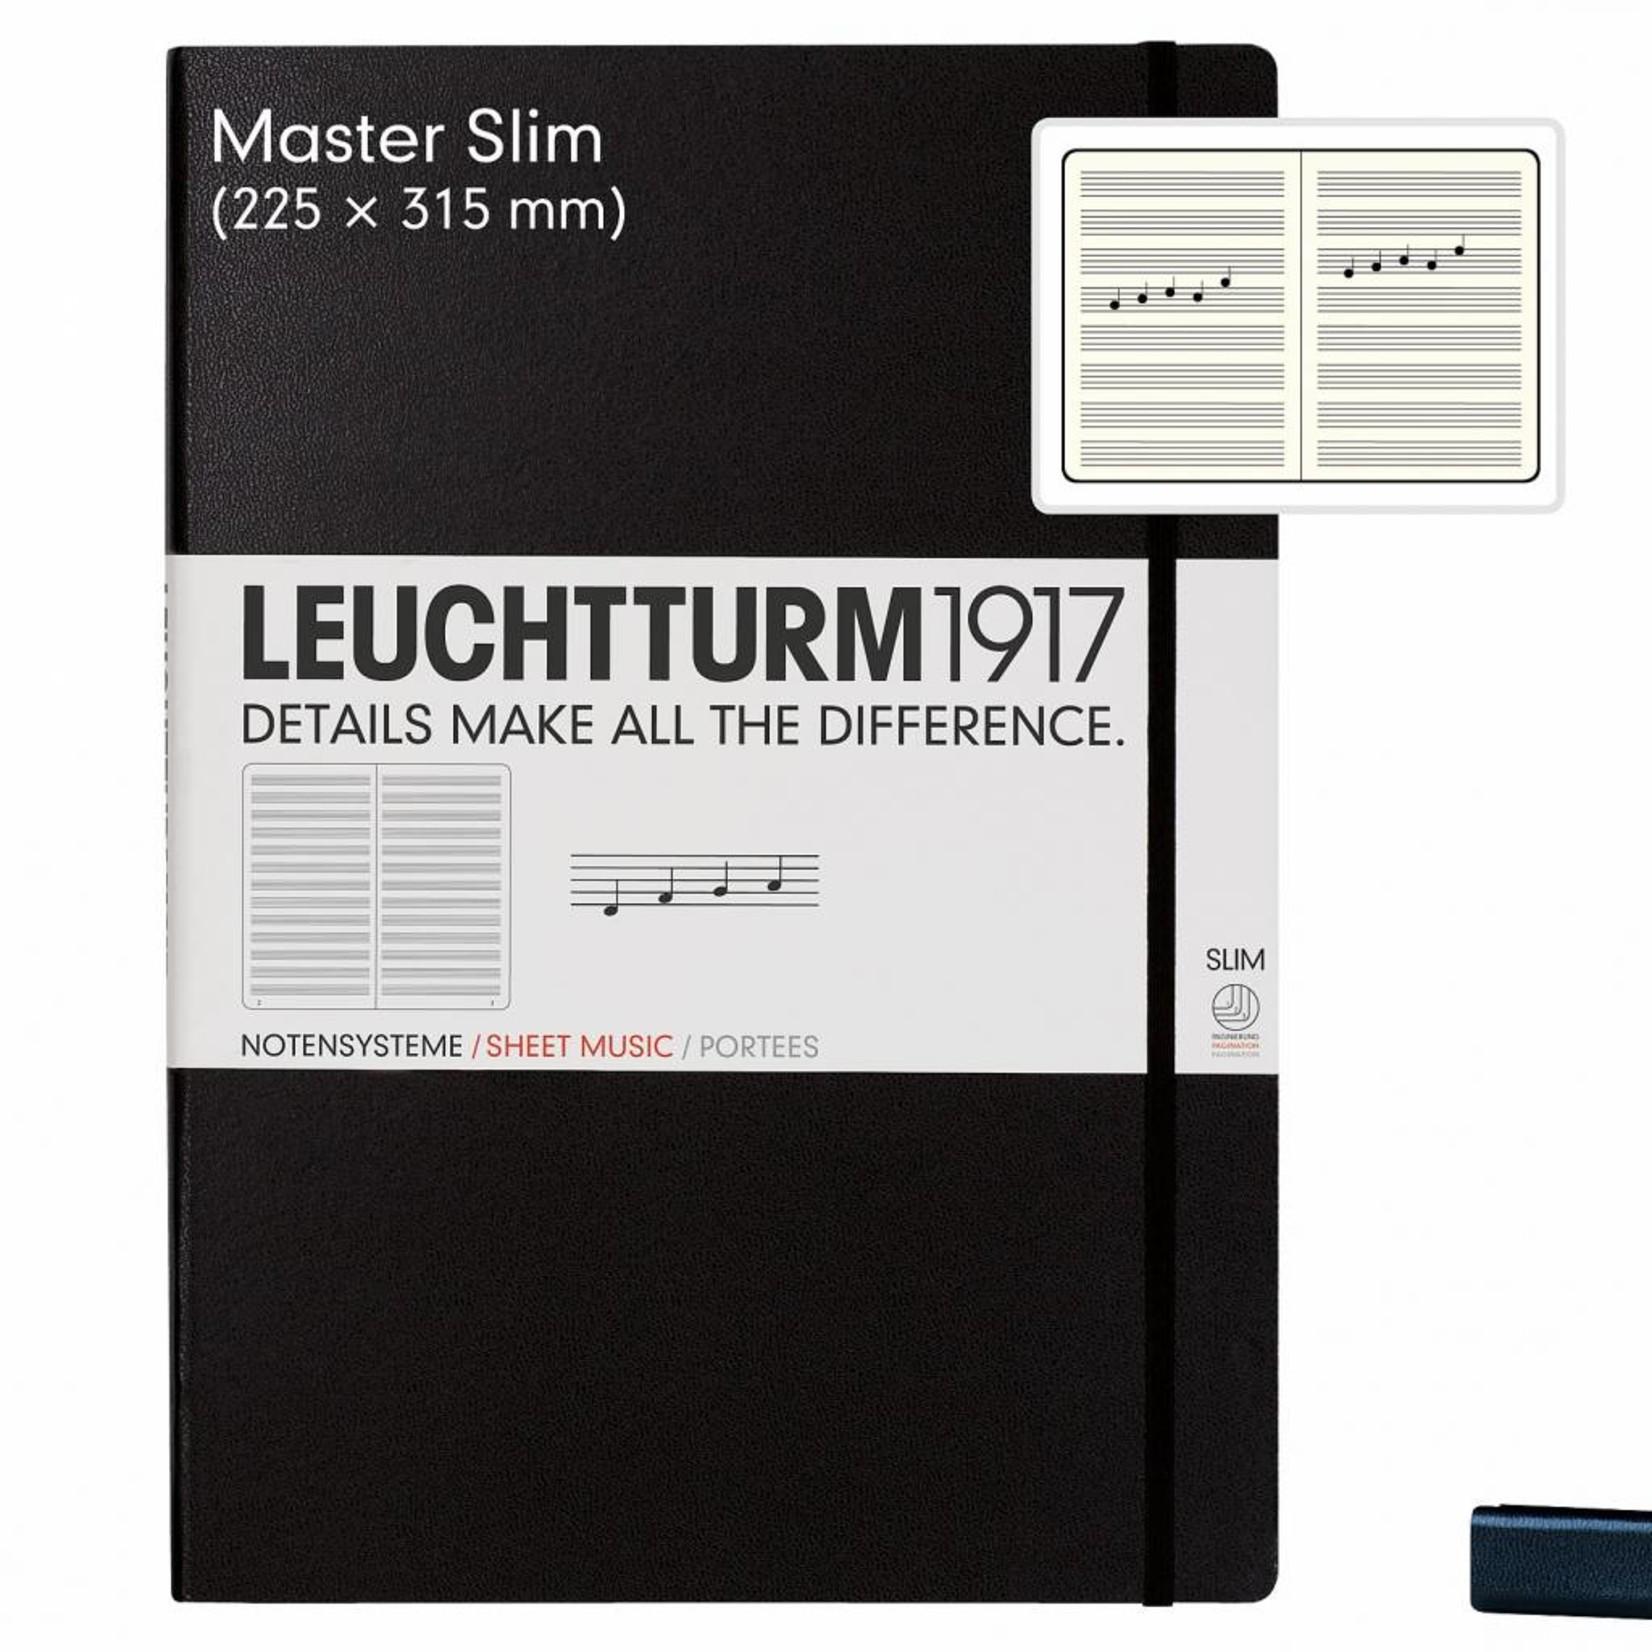 Leuchtturm1917 LT MASTER Slim Notensystem A4